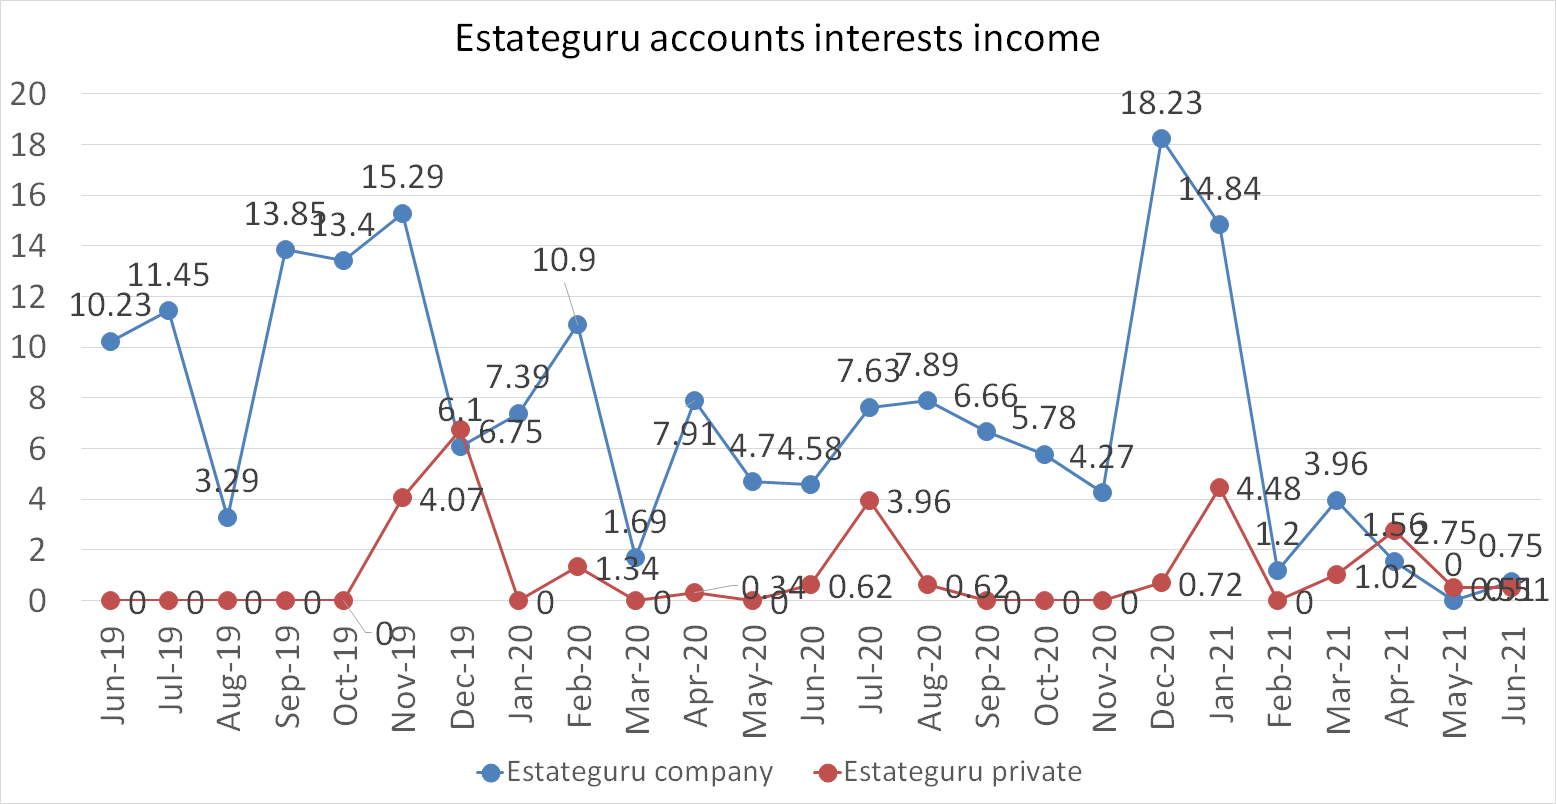 Estateguru accounts interests income in june 2021